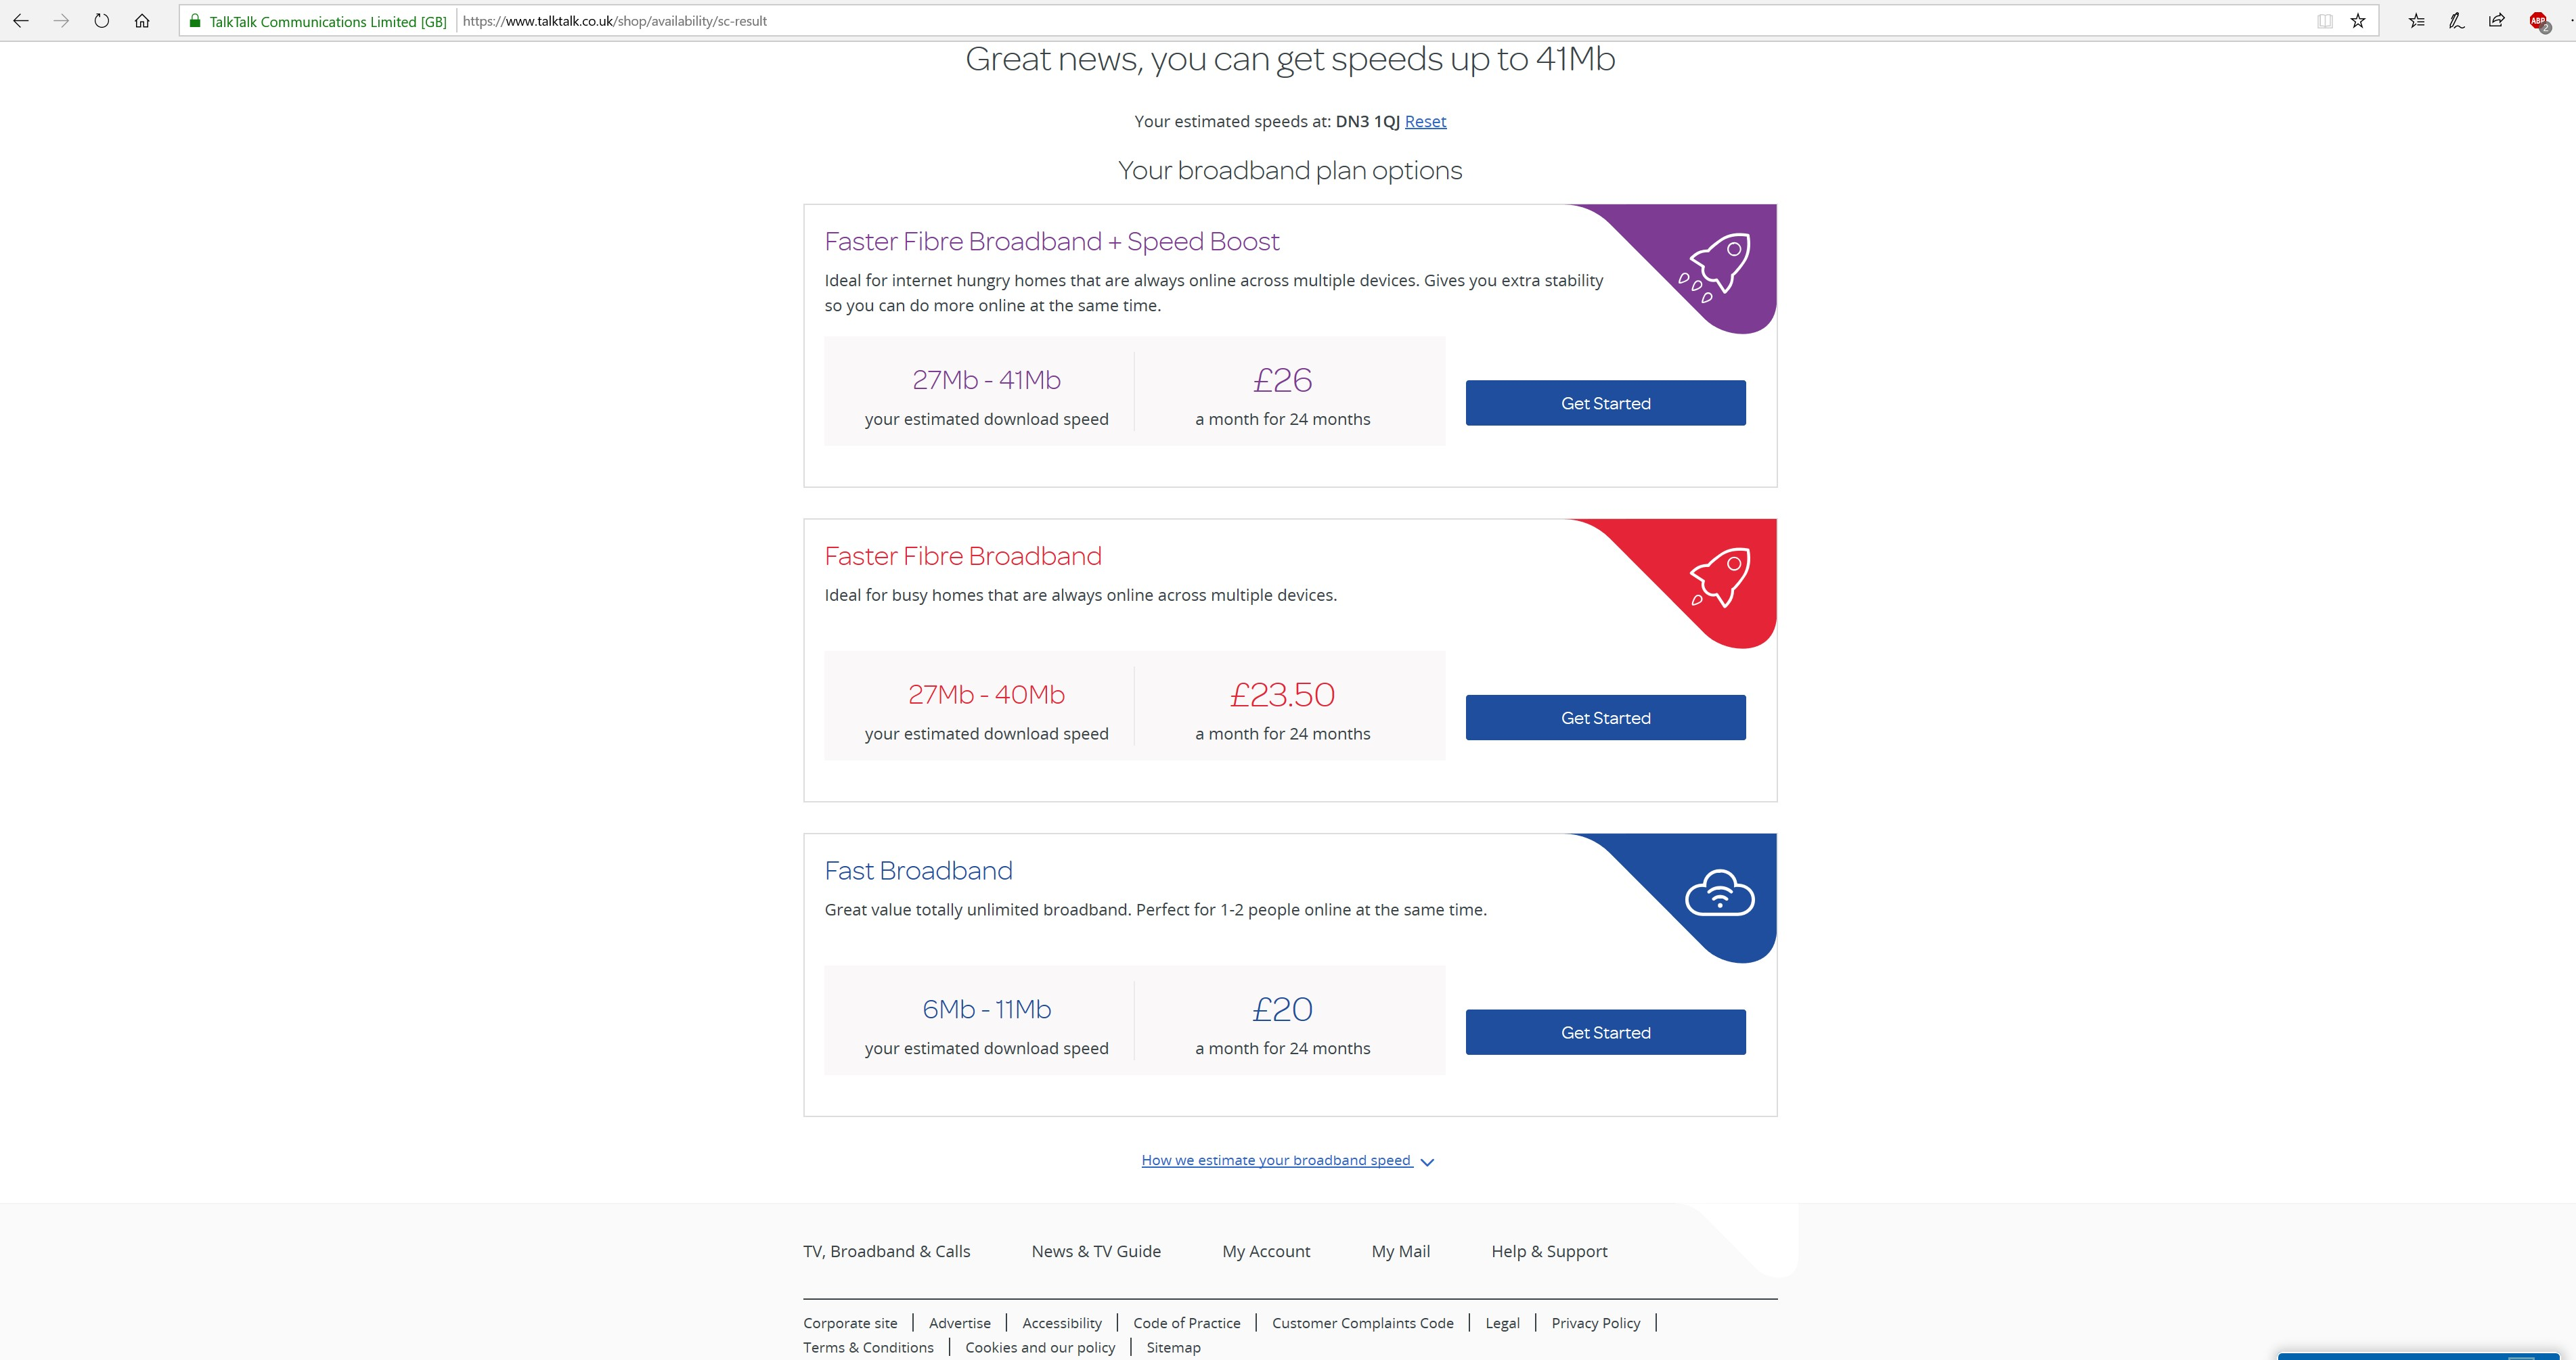 Upload Speed - Poor? - TalkTalk Help & Support